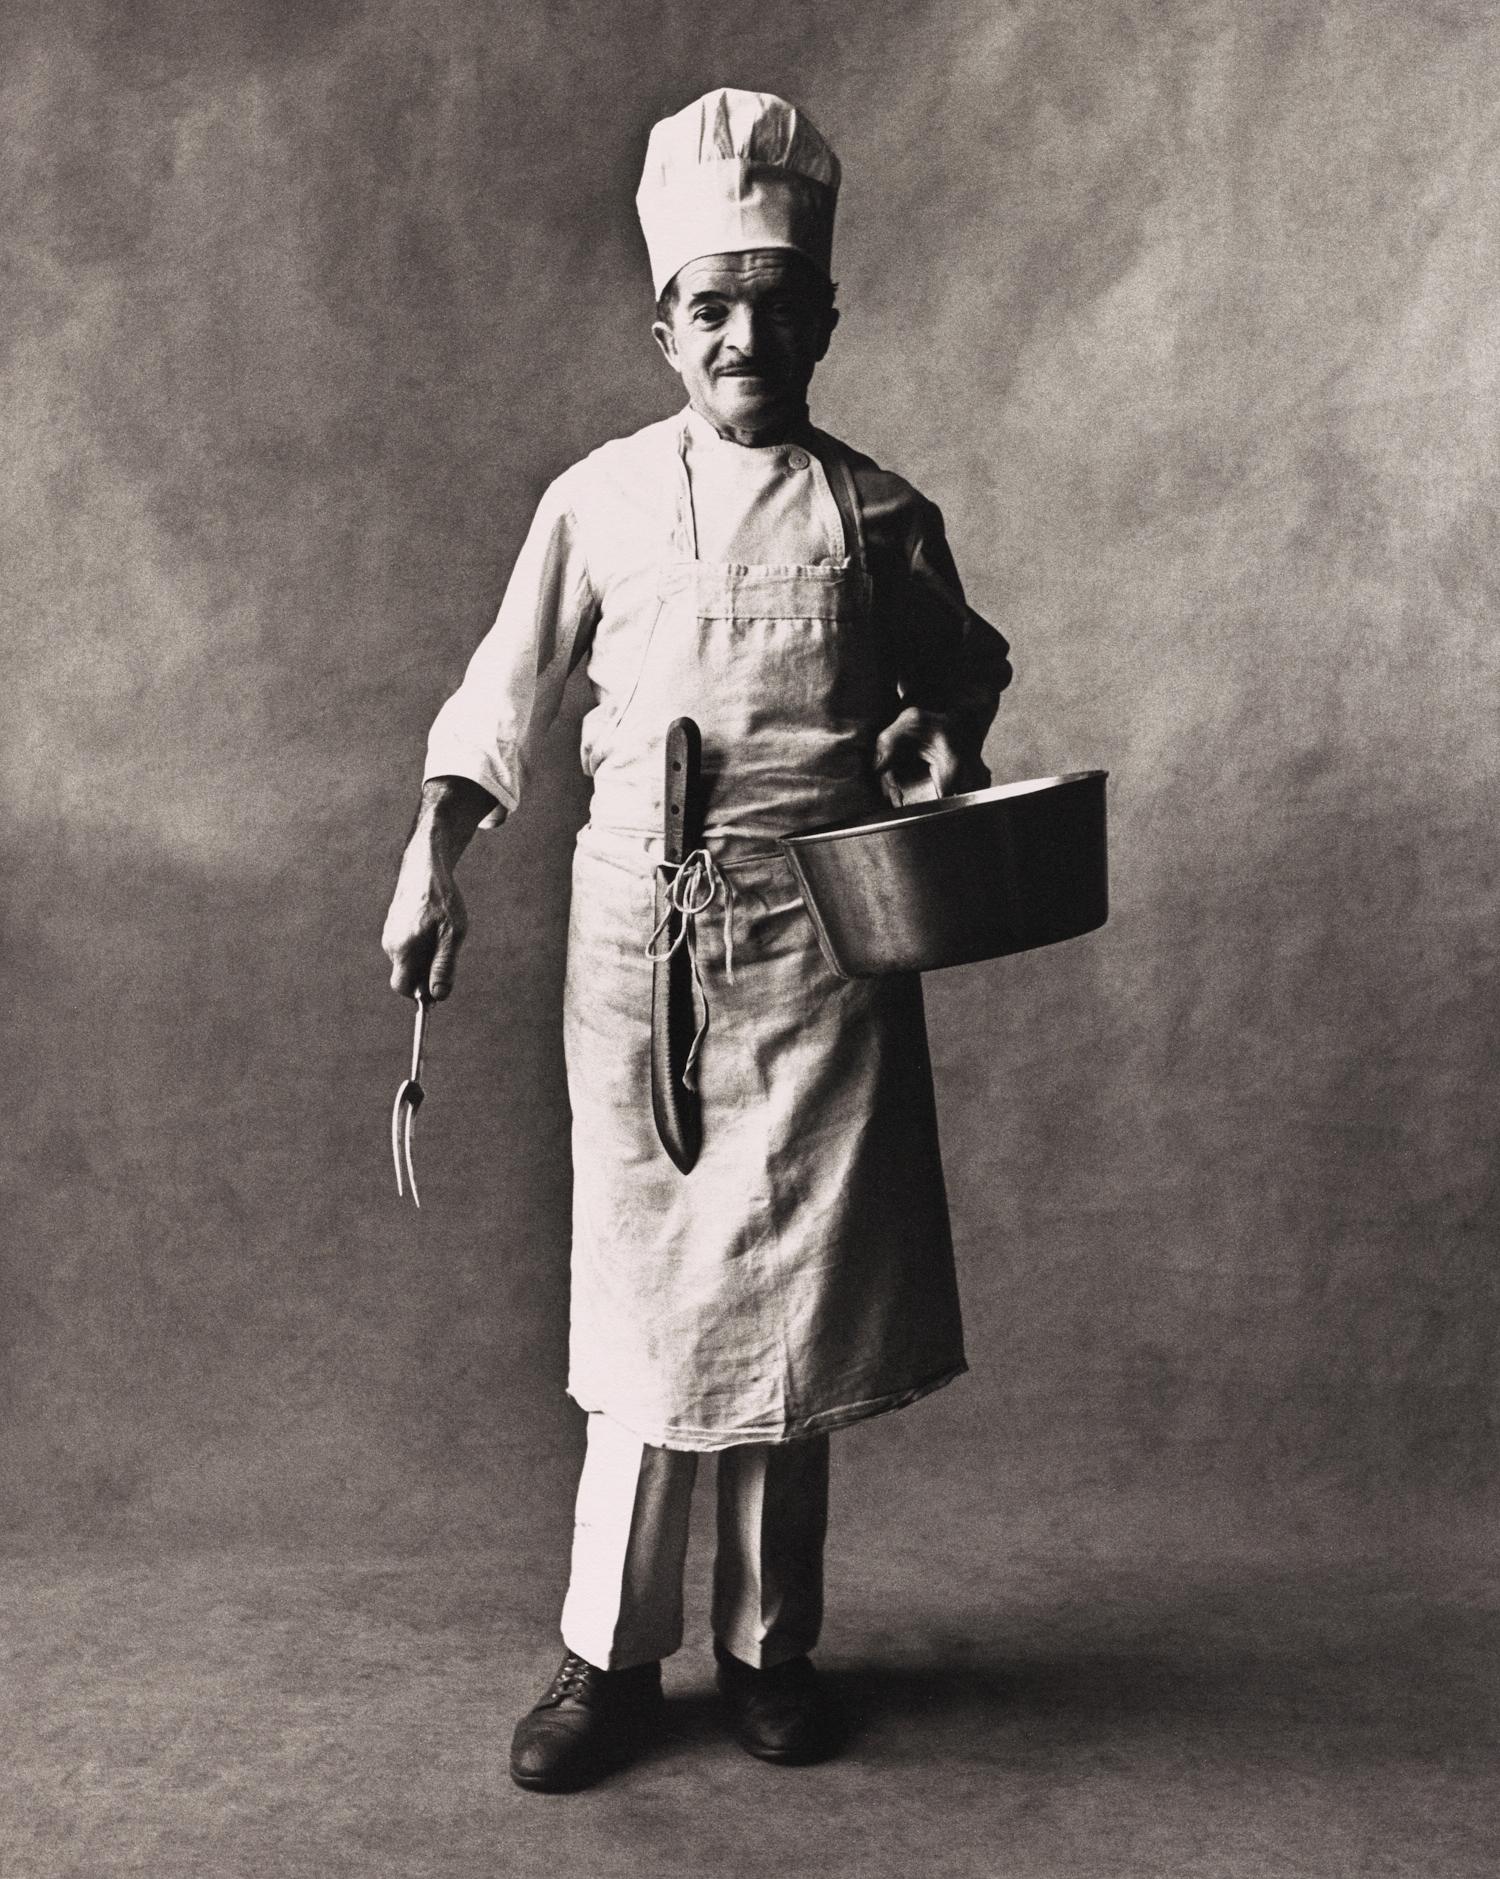 Chef (A) , New York, 1951 Platinum-palladium print © Condé Nast